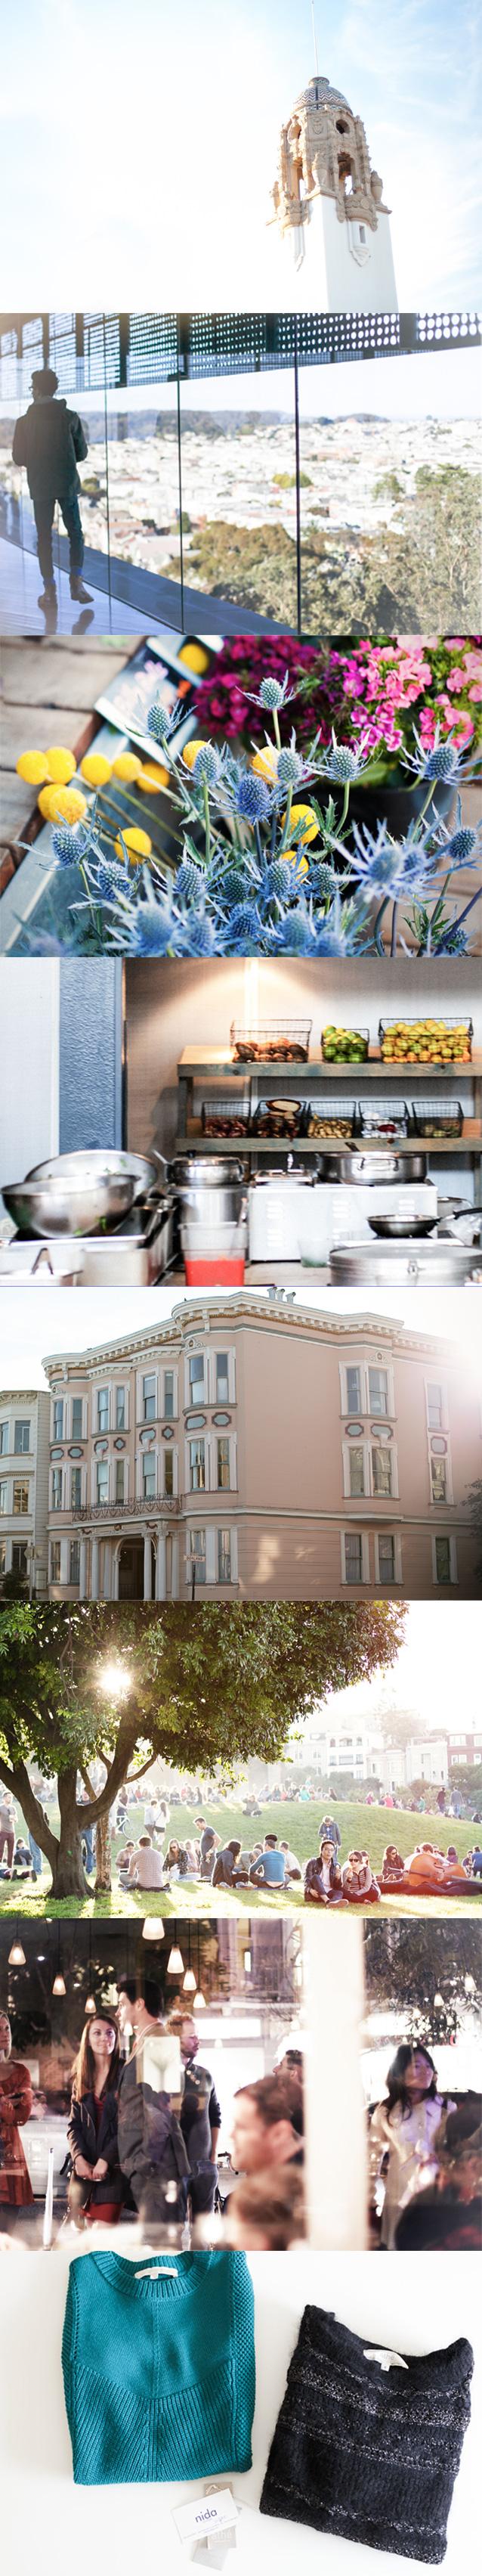 shl_San-Francisco-Diary_20130211.jpg